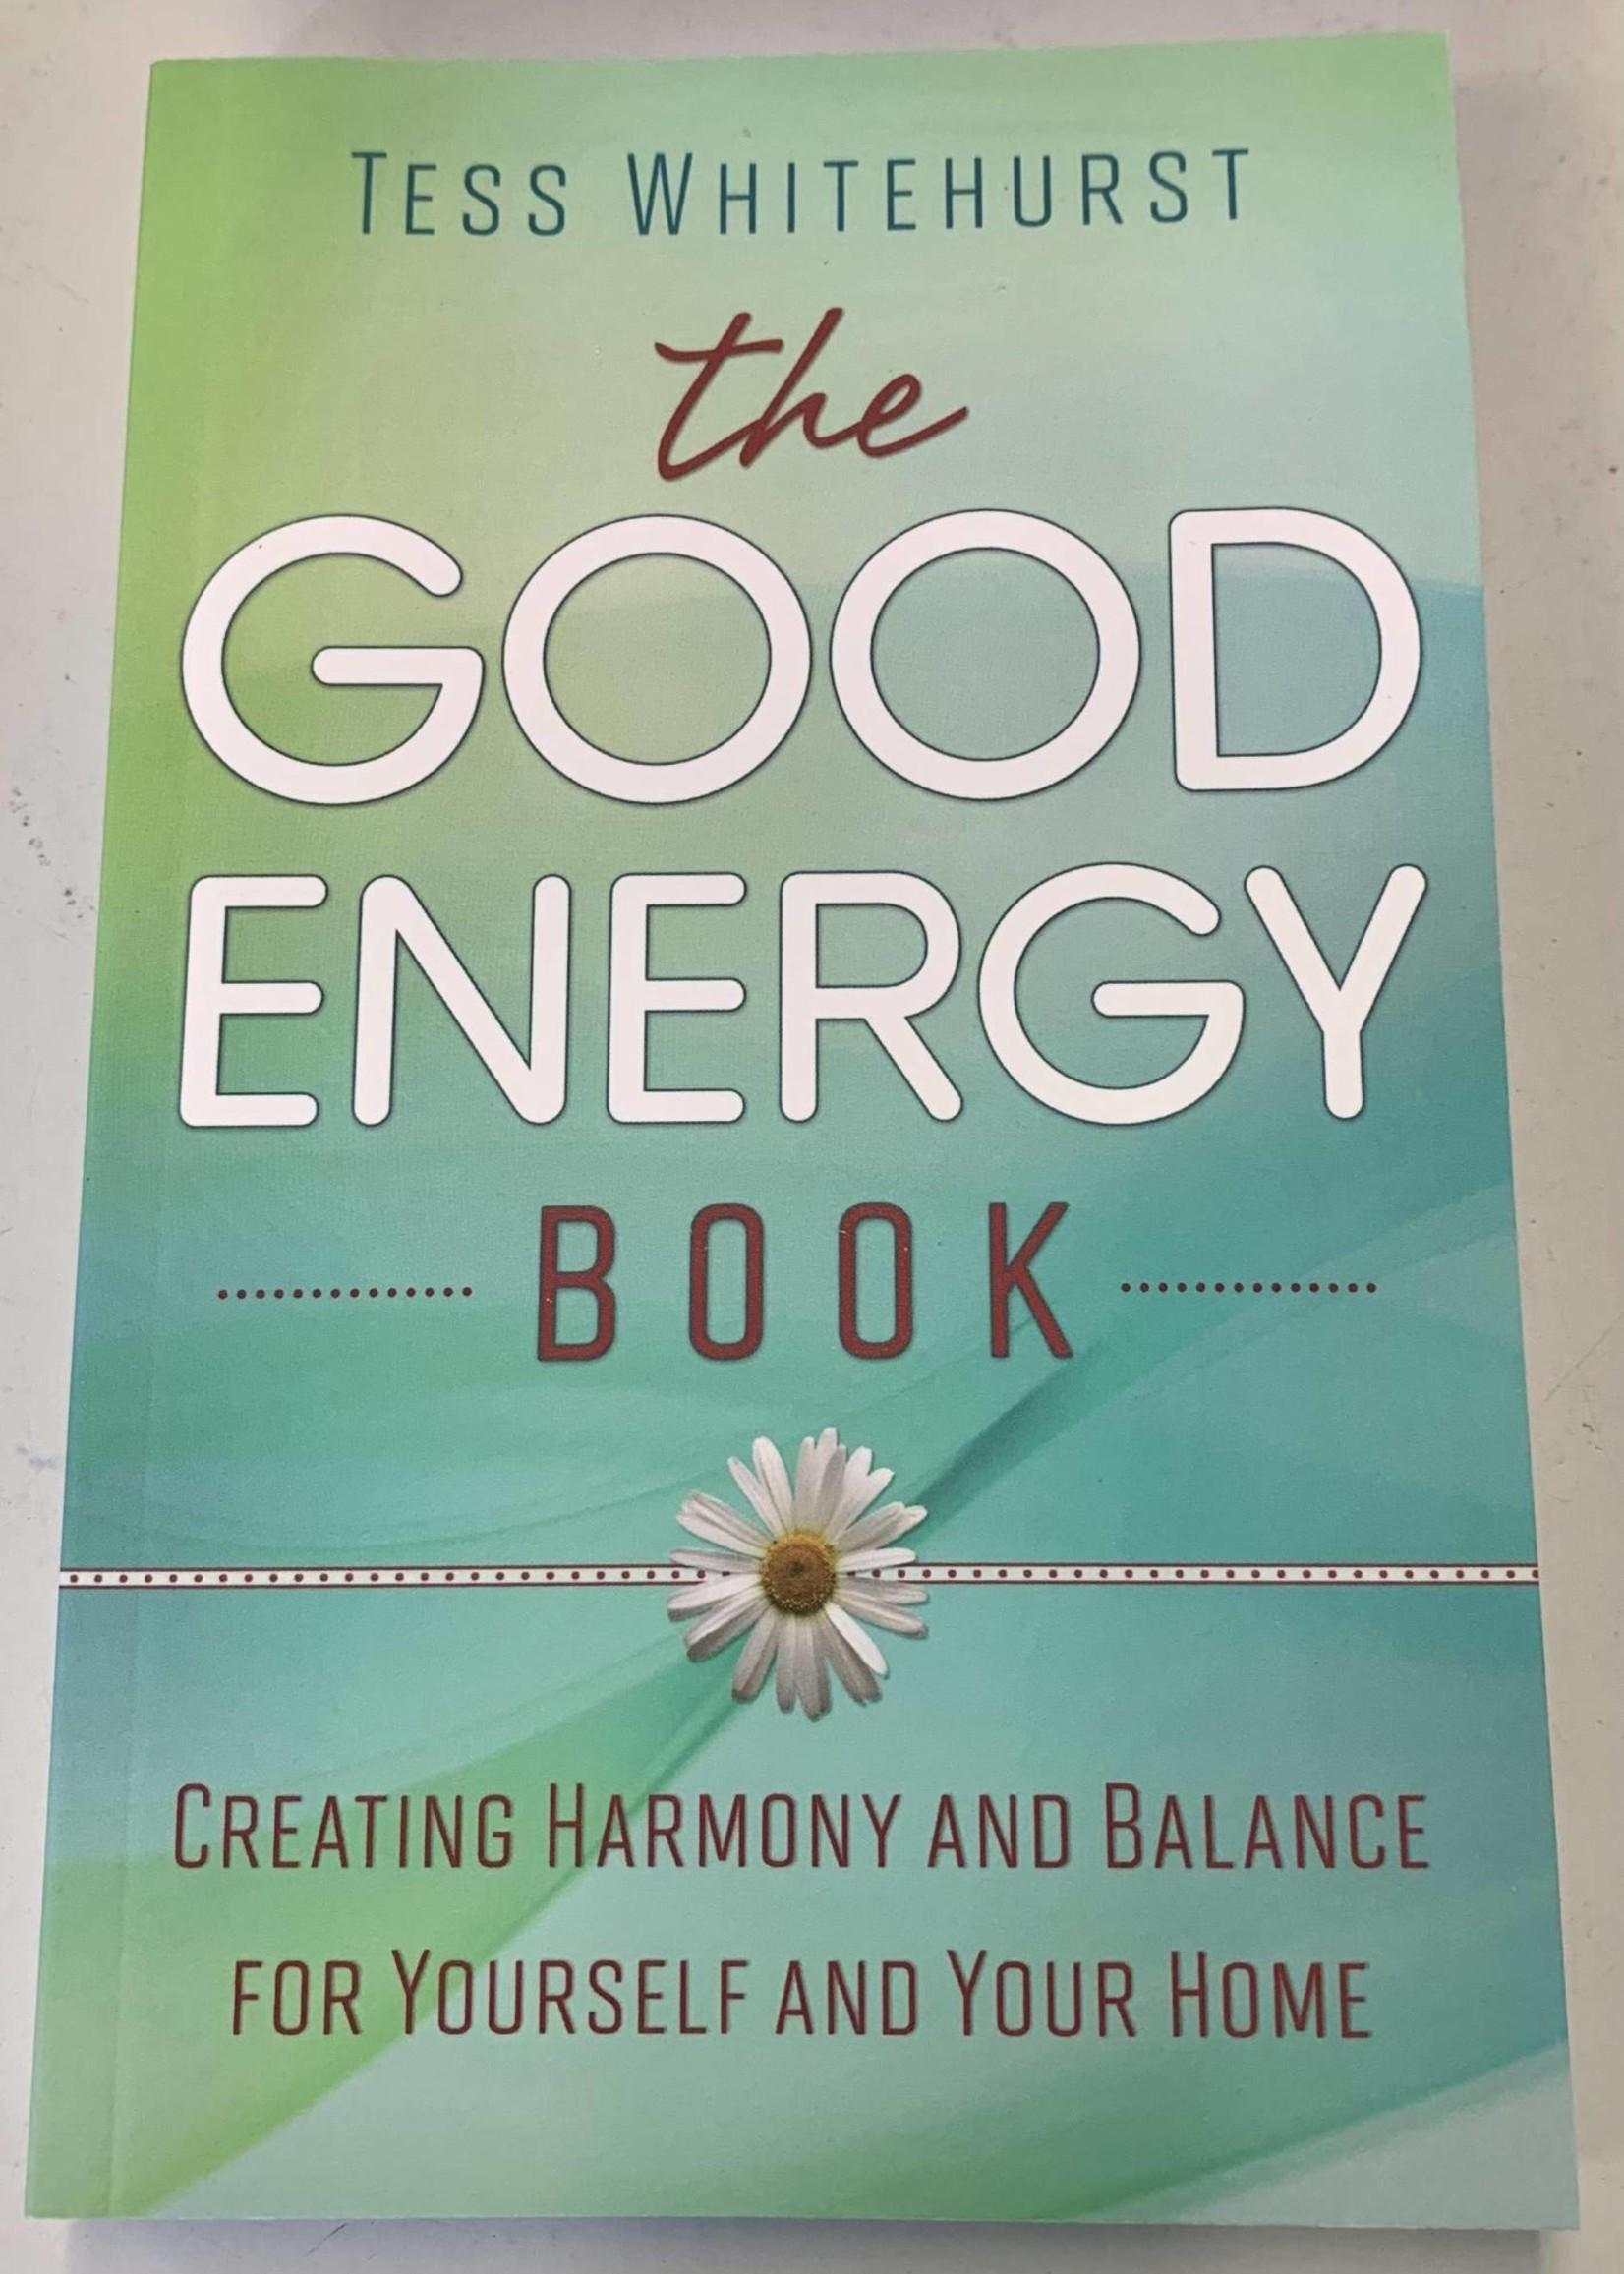 The Good Energy Book - BY TESS WHITEHURST